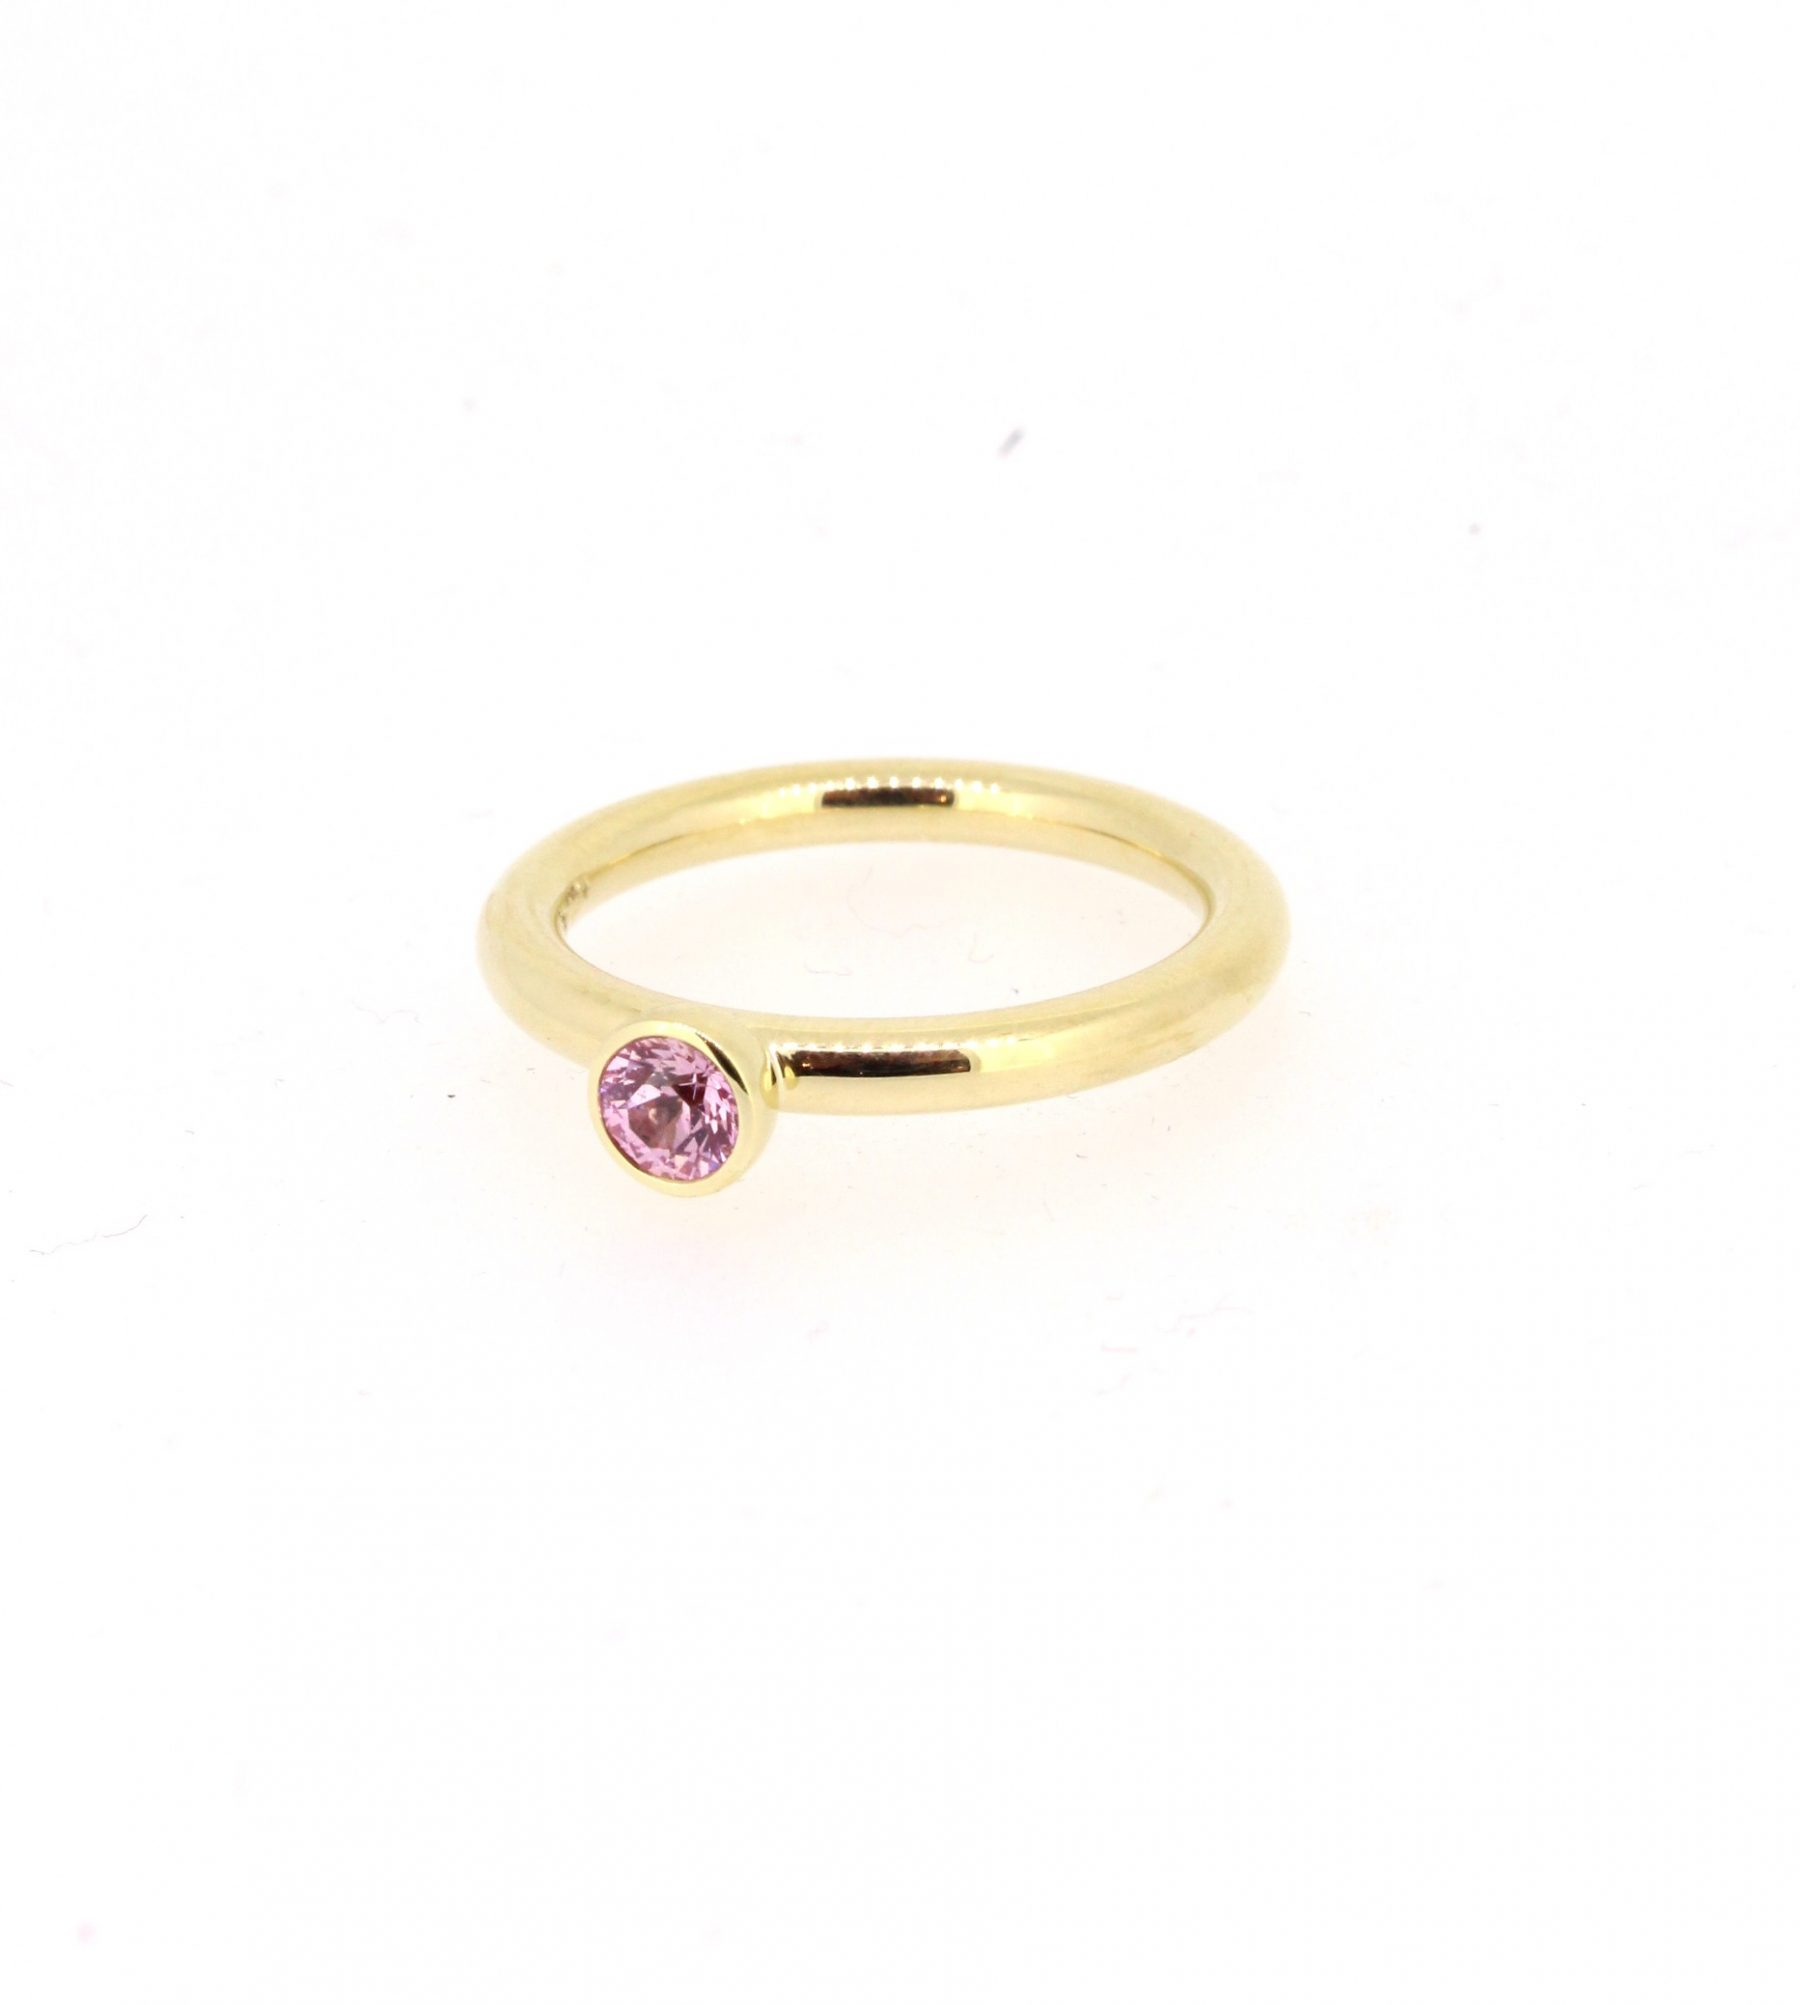 Ring Floh Saphir pink 18ctGold - Georg Spreng - 420spre07-1